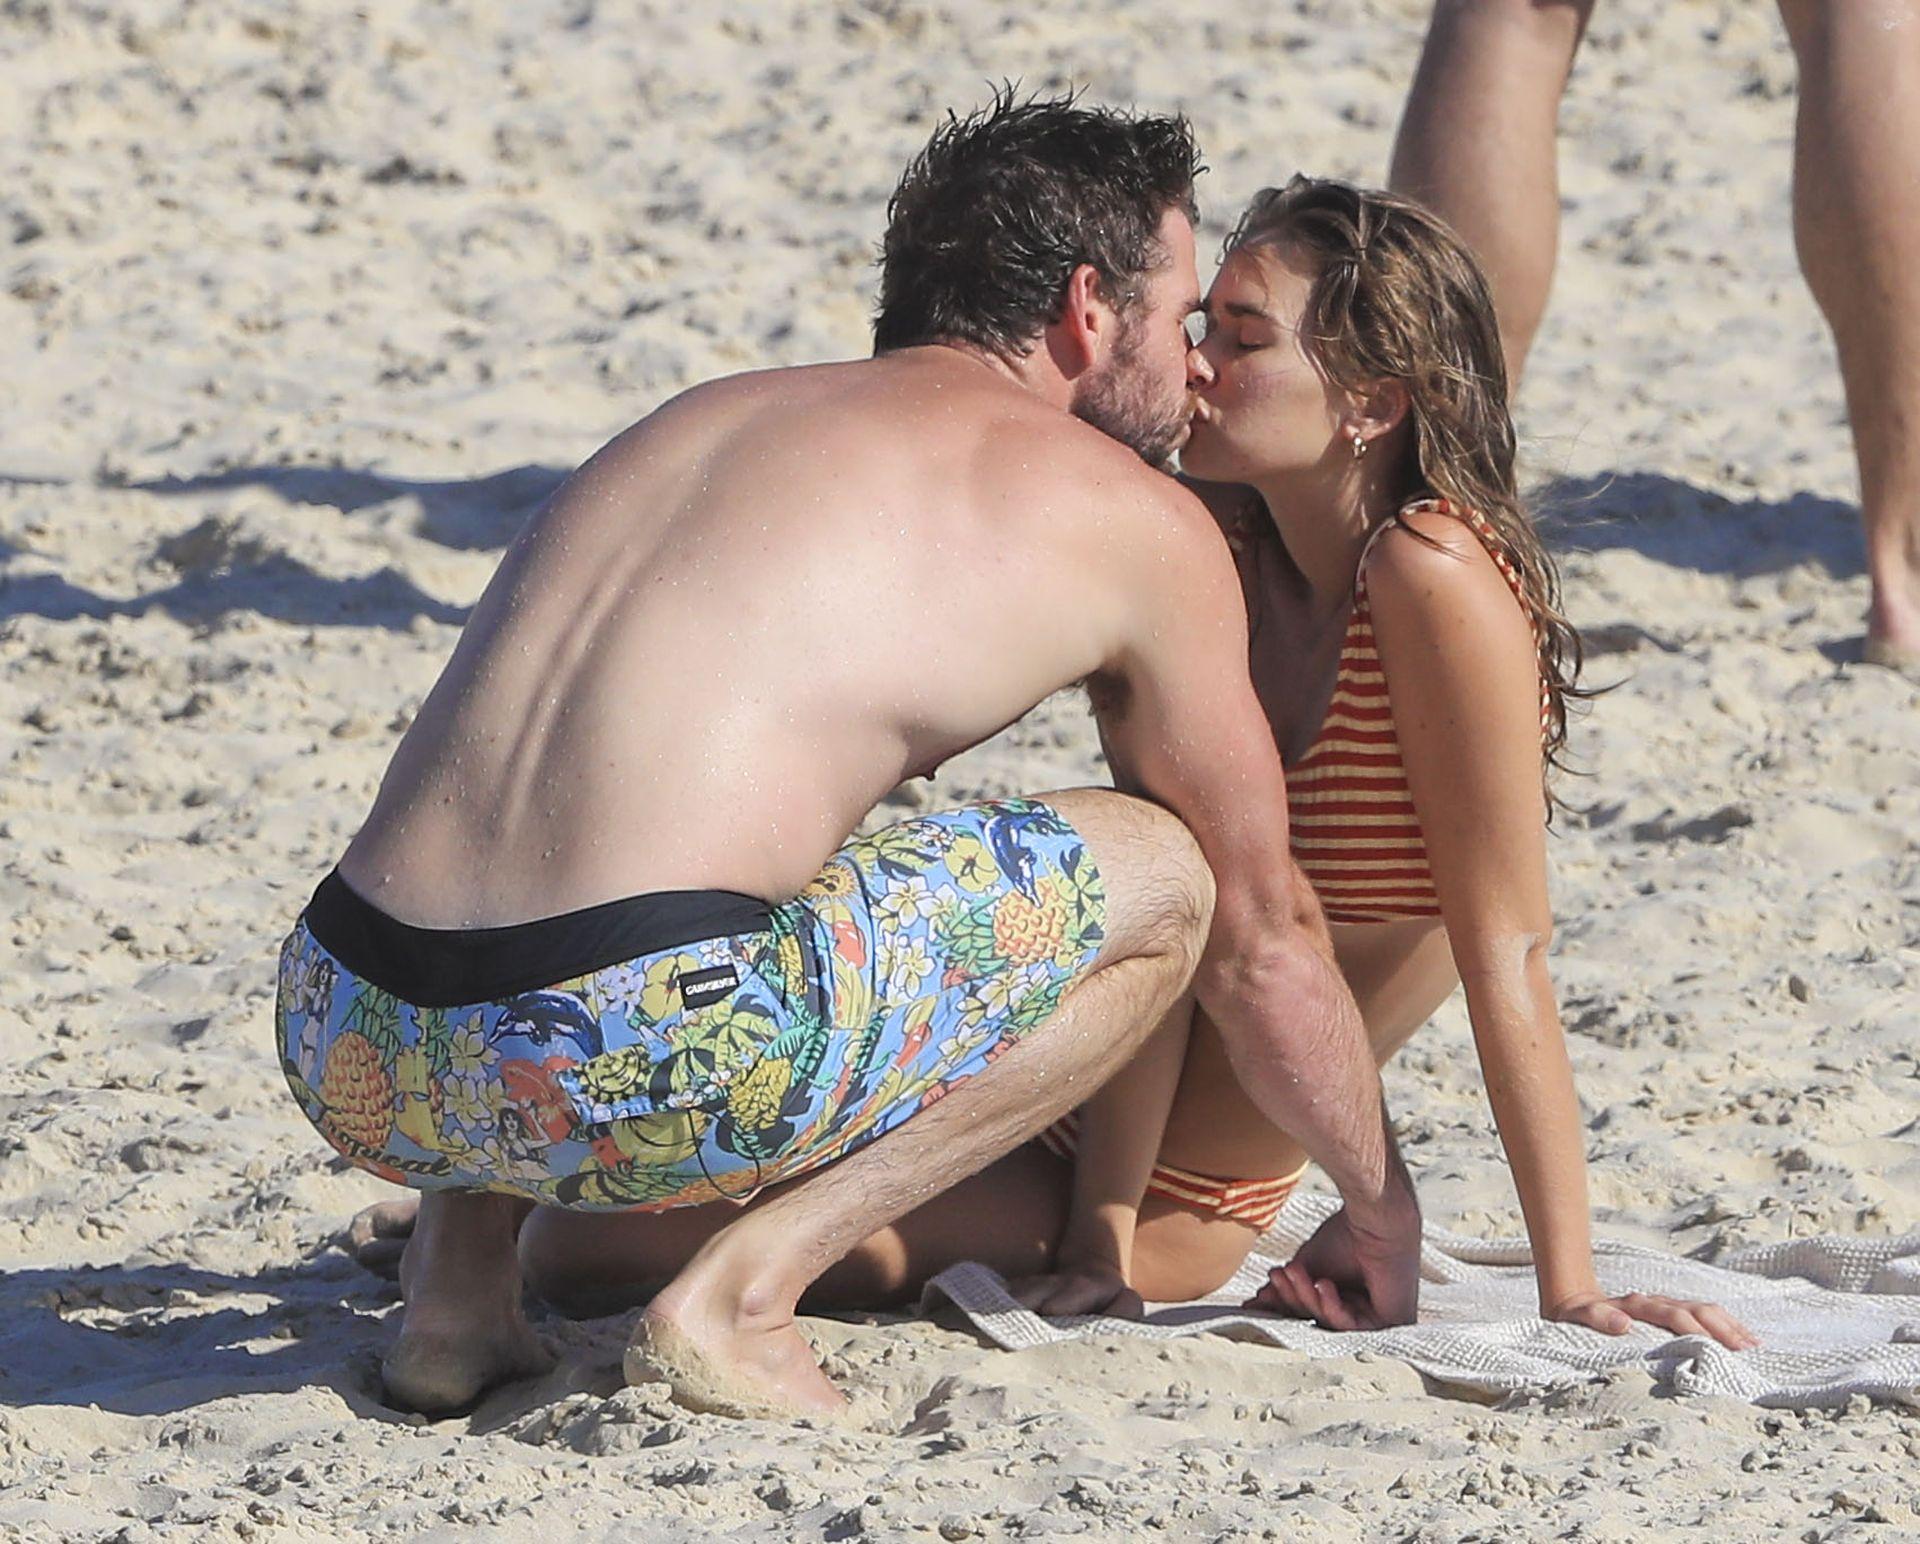 Gabriella Brooks Hot – Liam Hemsworth's New Girlfriend 0012